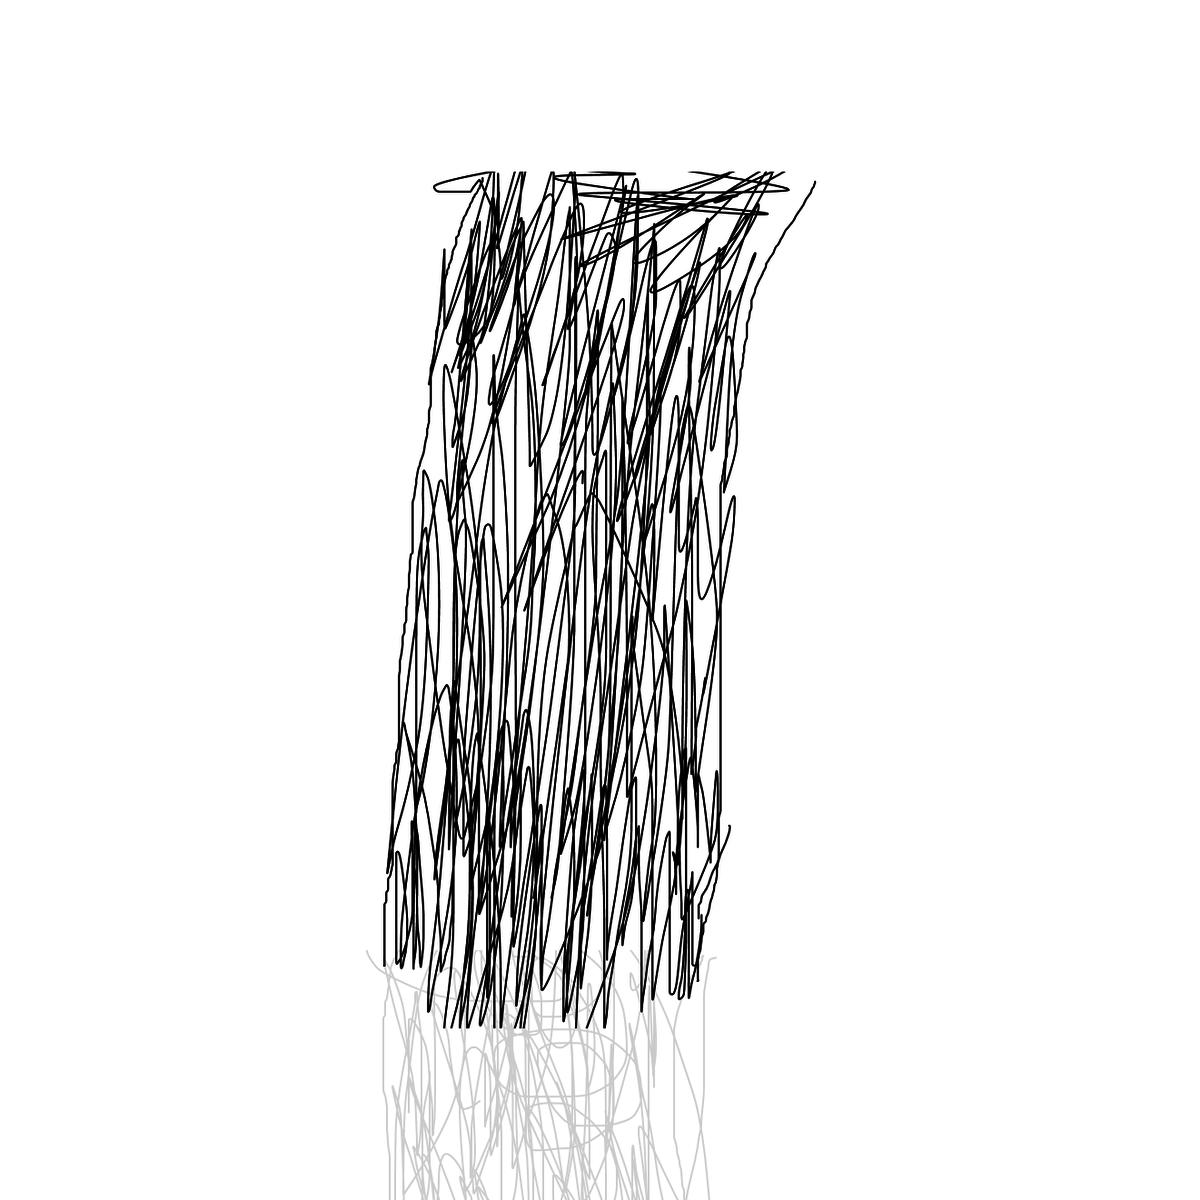 BAAAM drawing#11435 lat:52.4758872985839840lng: 13.4054975509643550